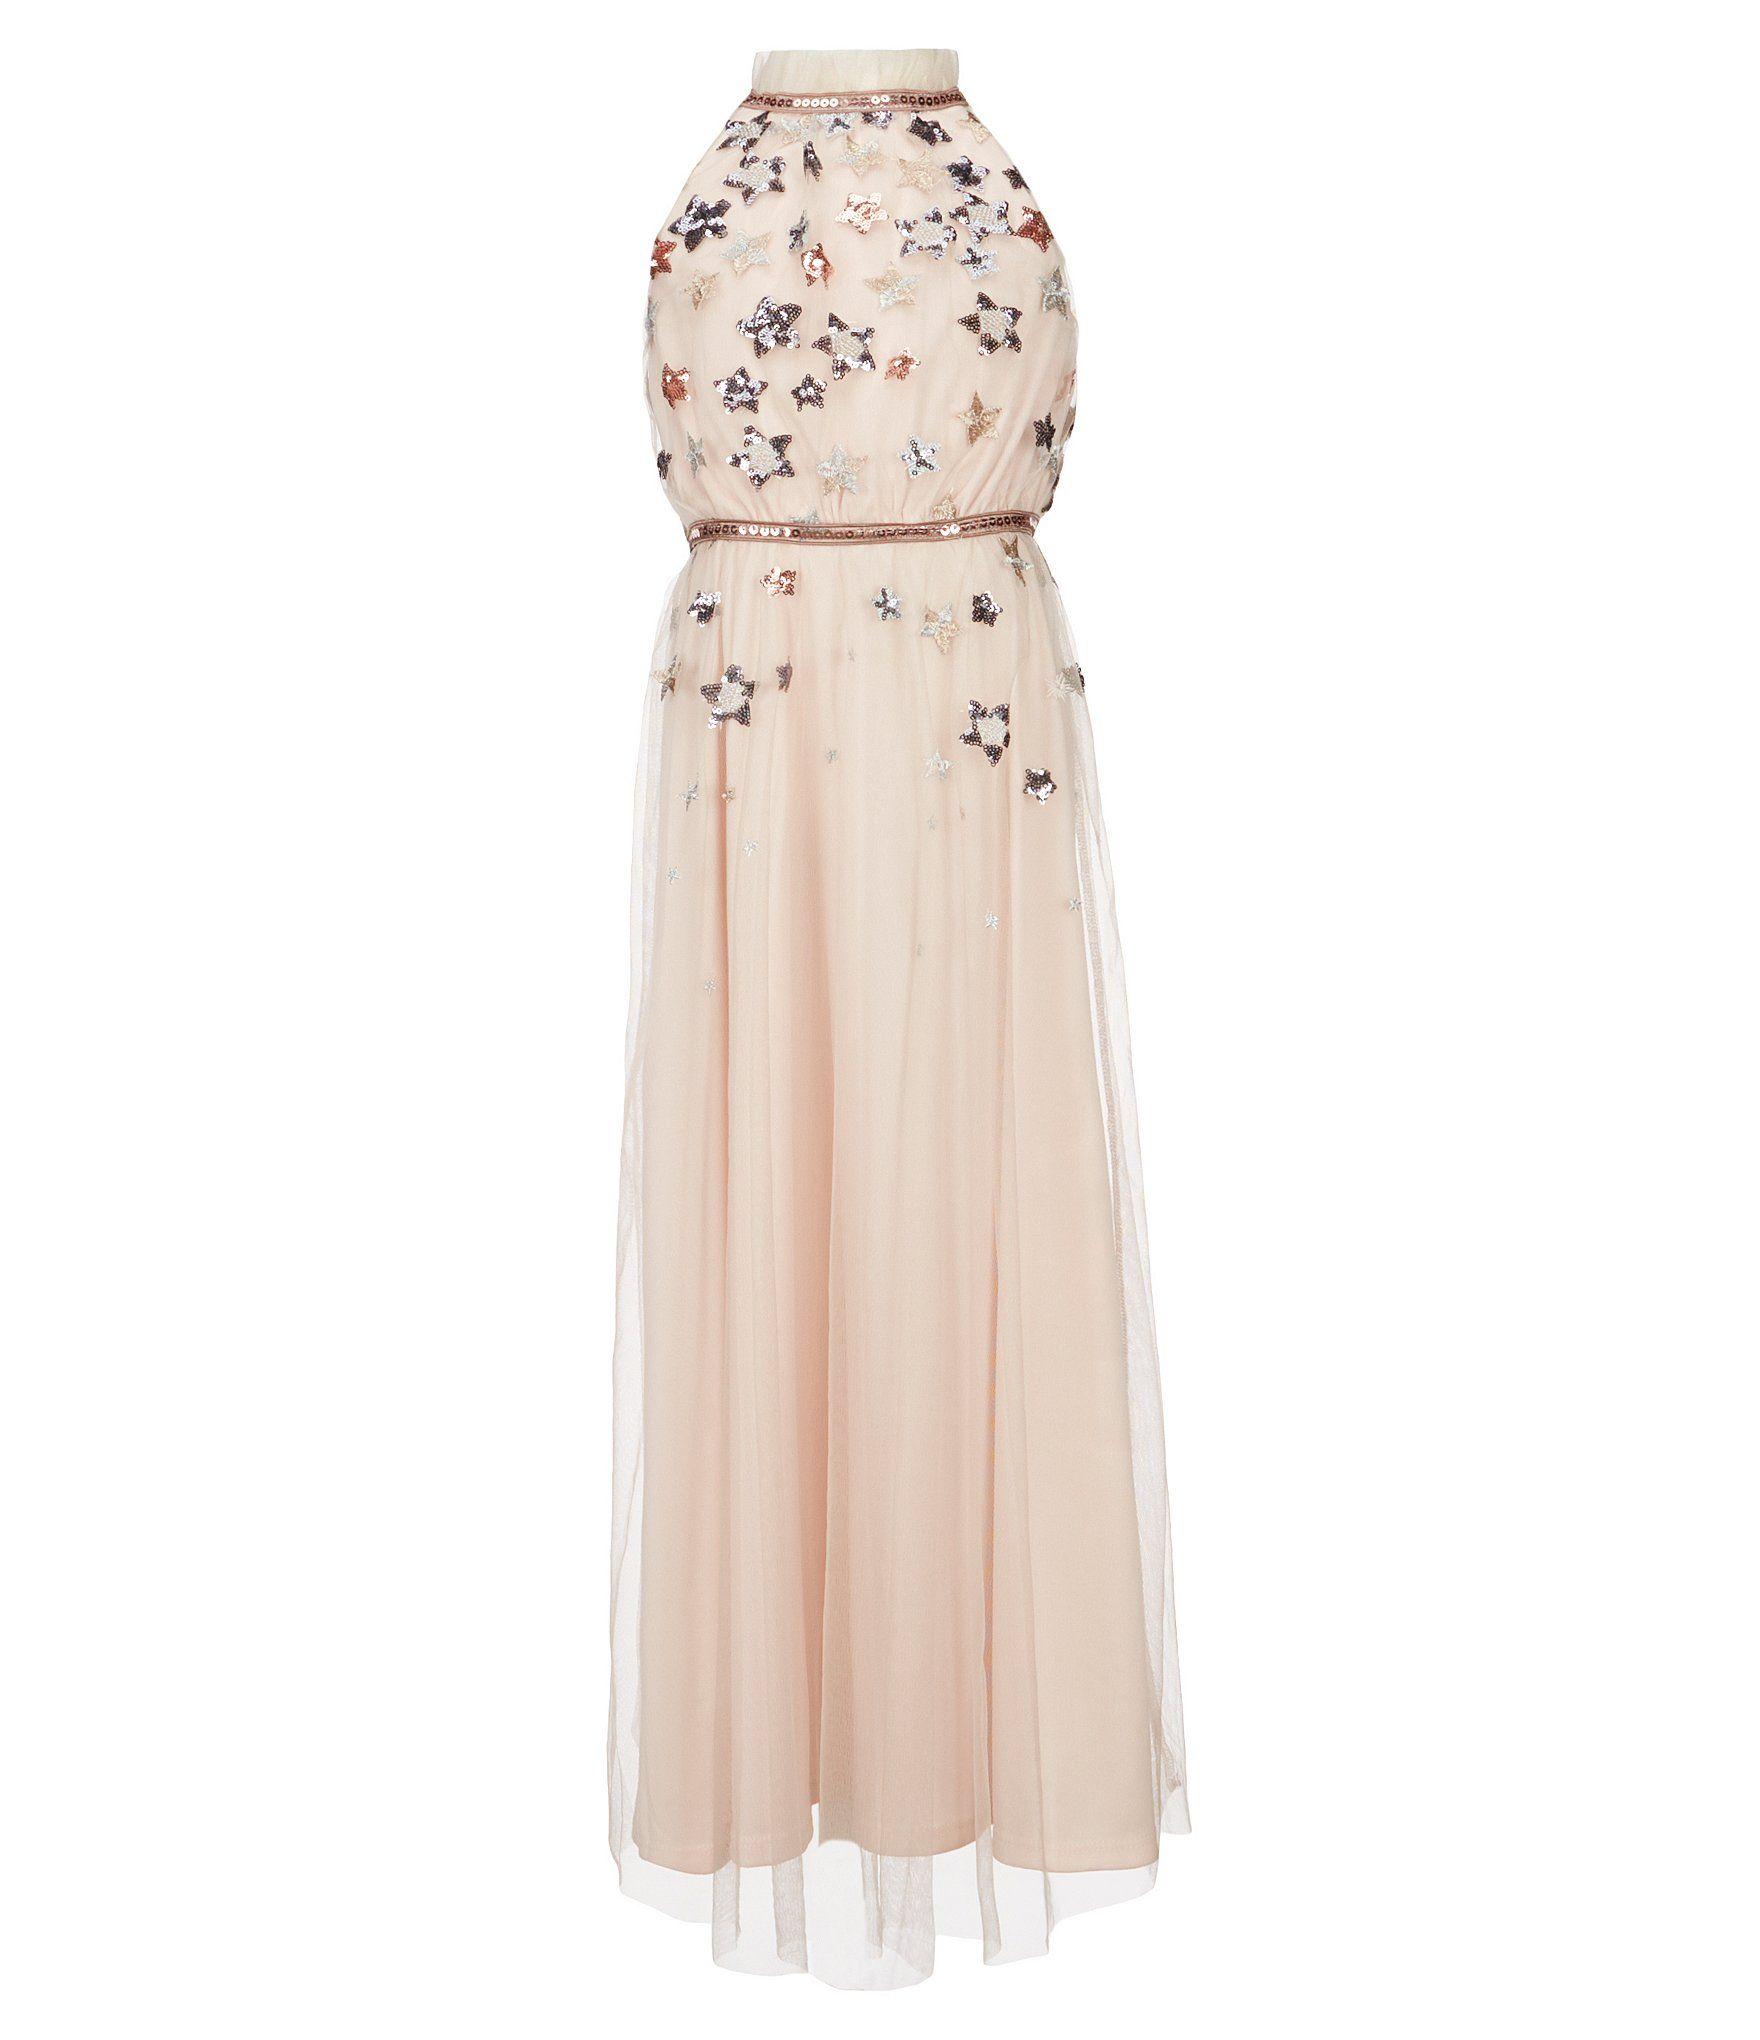 05f85ba9e3f4 Shop for GB Girls Social Big Girls 7-16 Star-Print Maxi Dress at  Dillards.com. Visit Dillards.com to find clothing